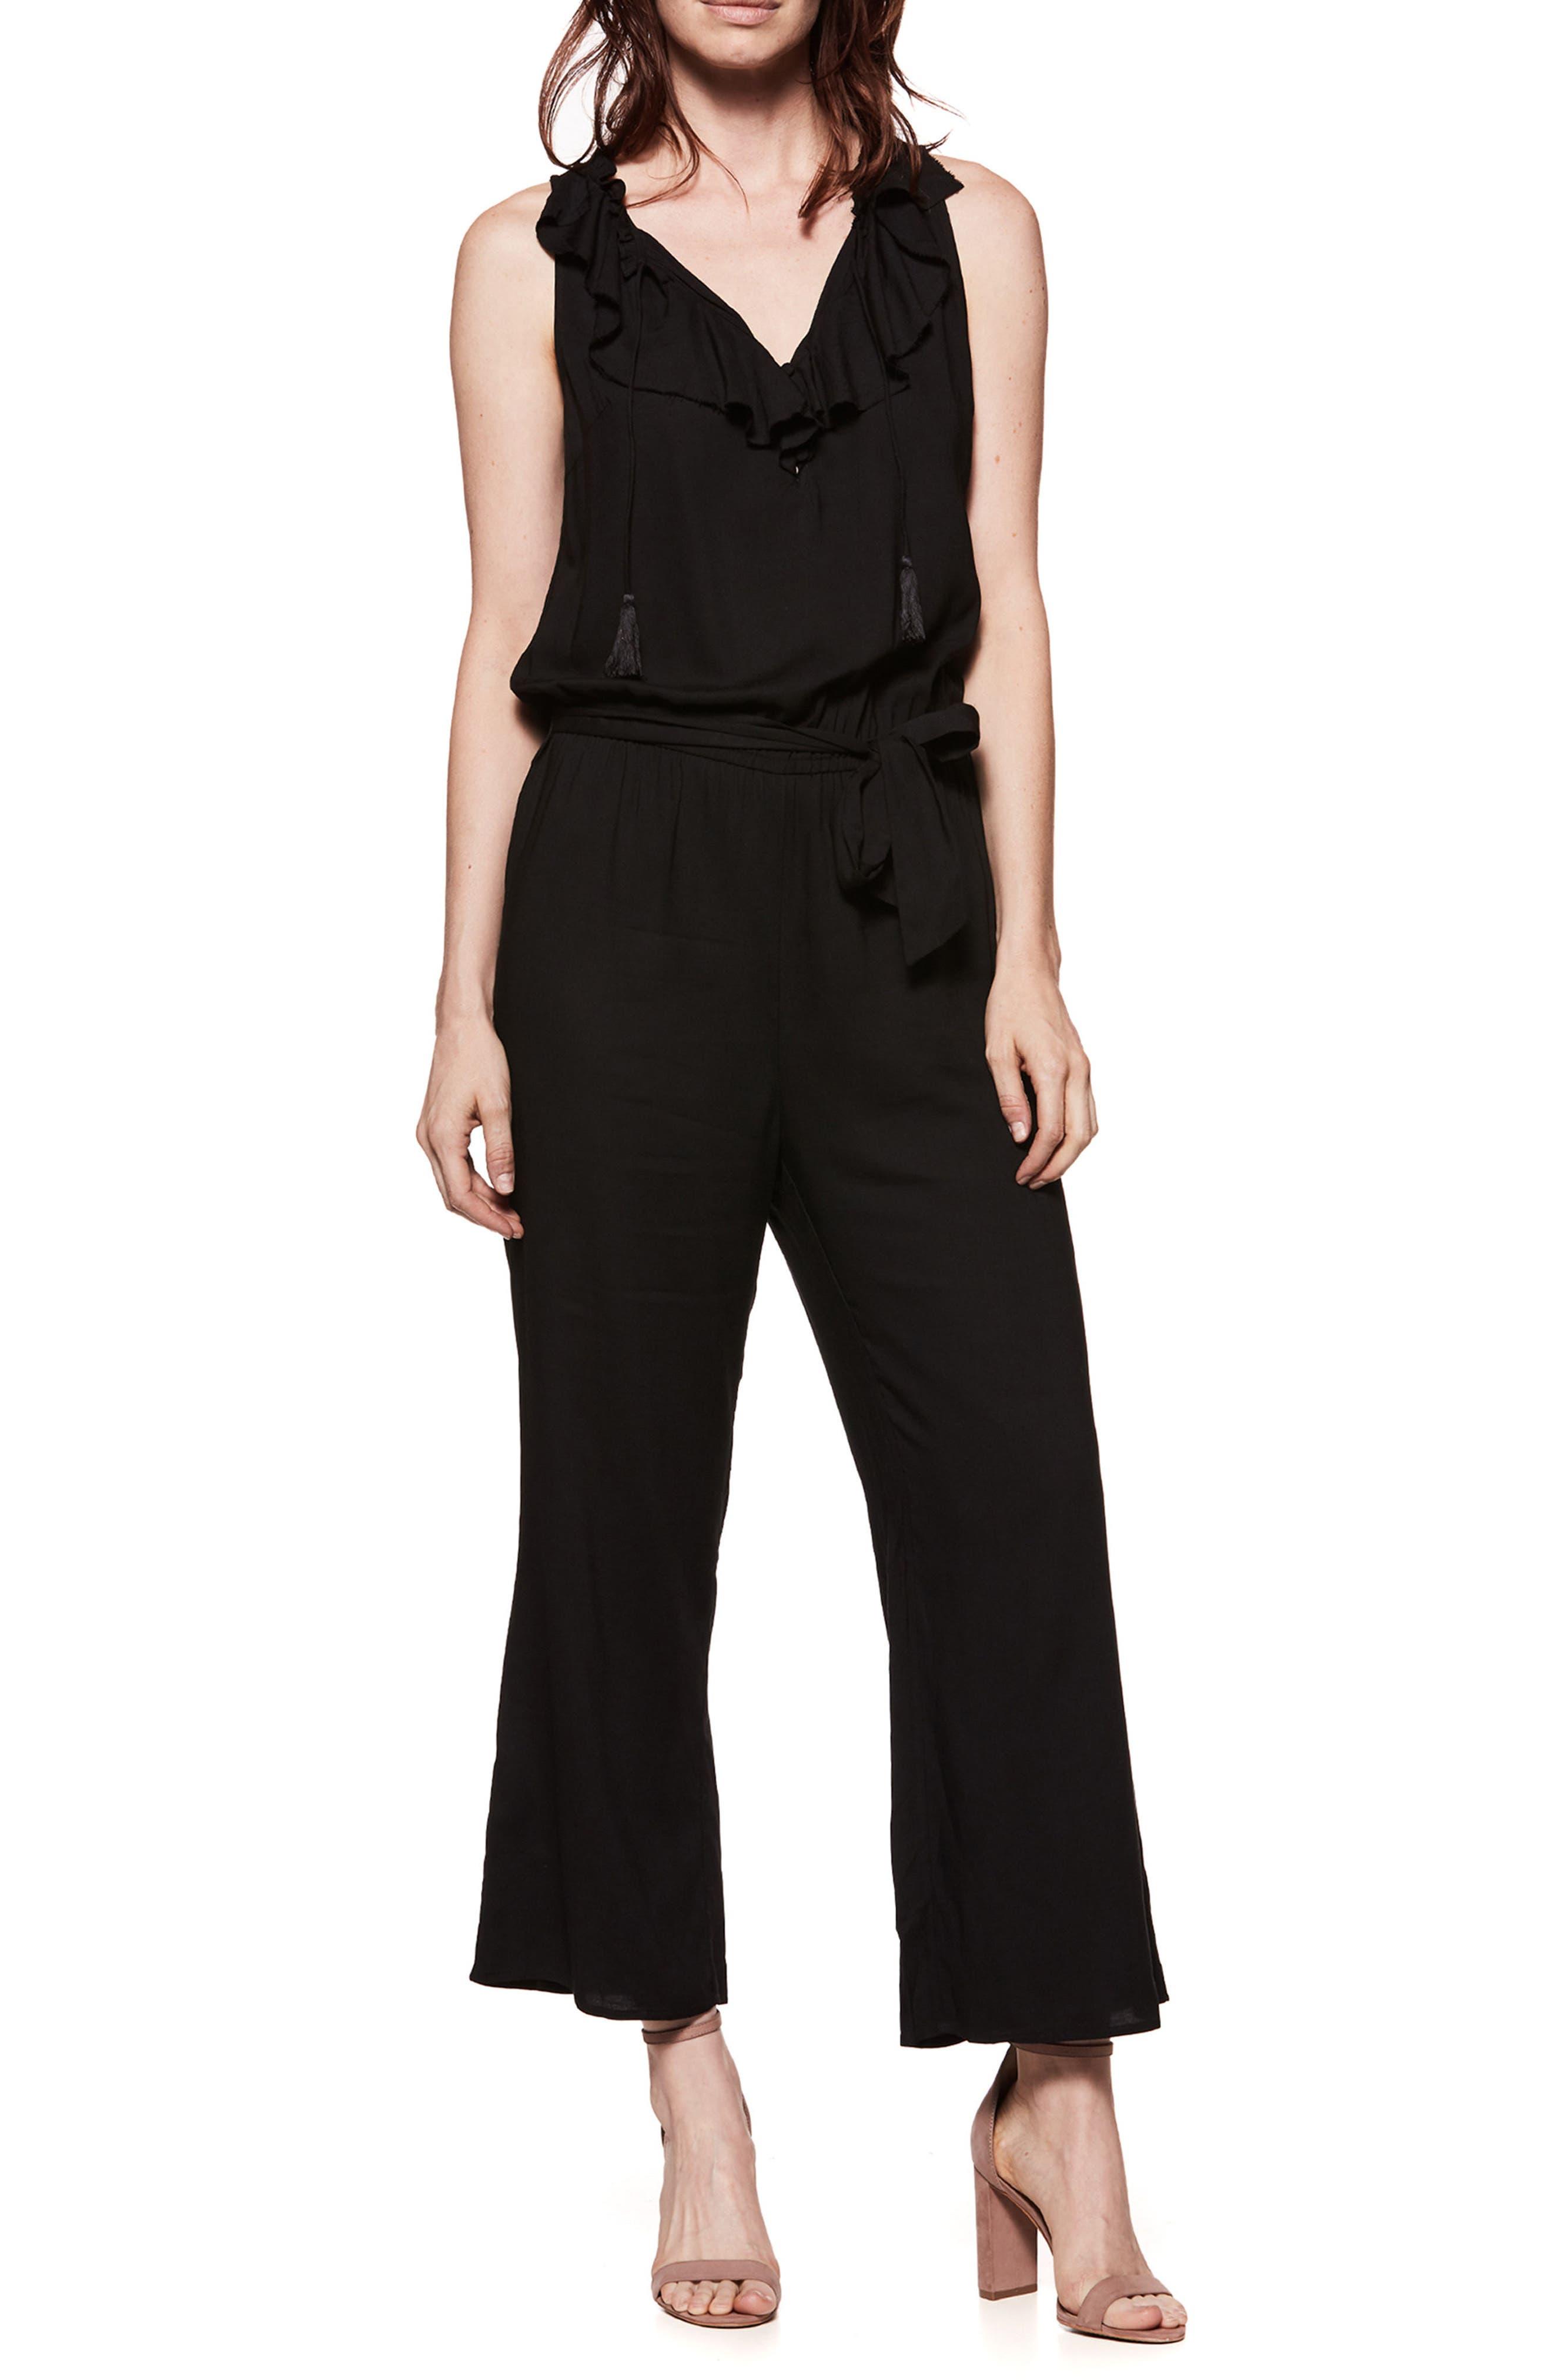 Paletta Ruffle Neck Jumpsuit,                             Main thumbnail 1, color,                             BLACK